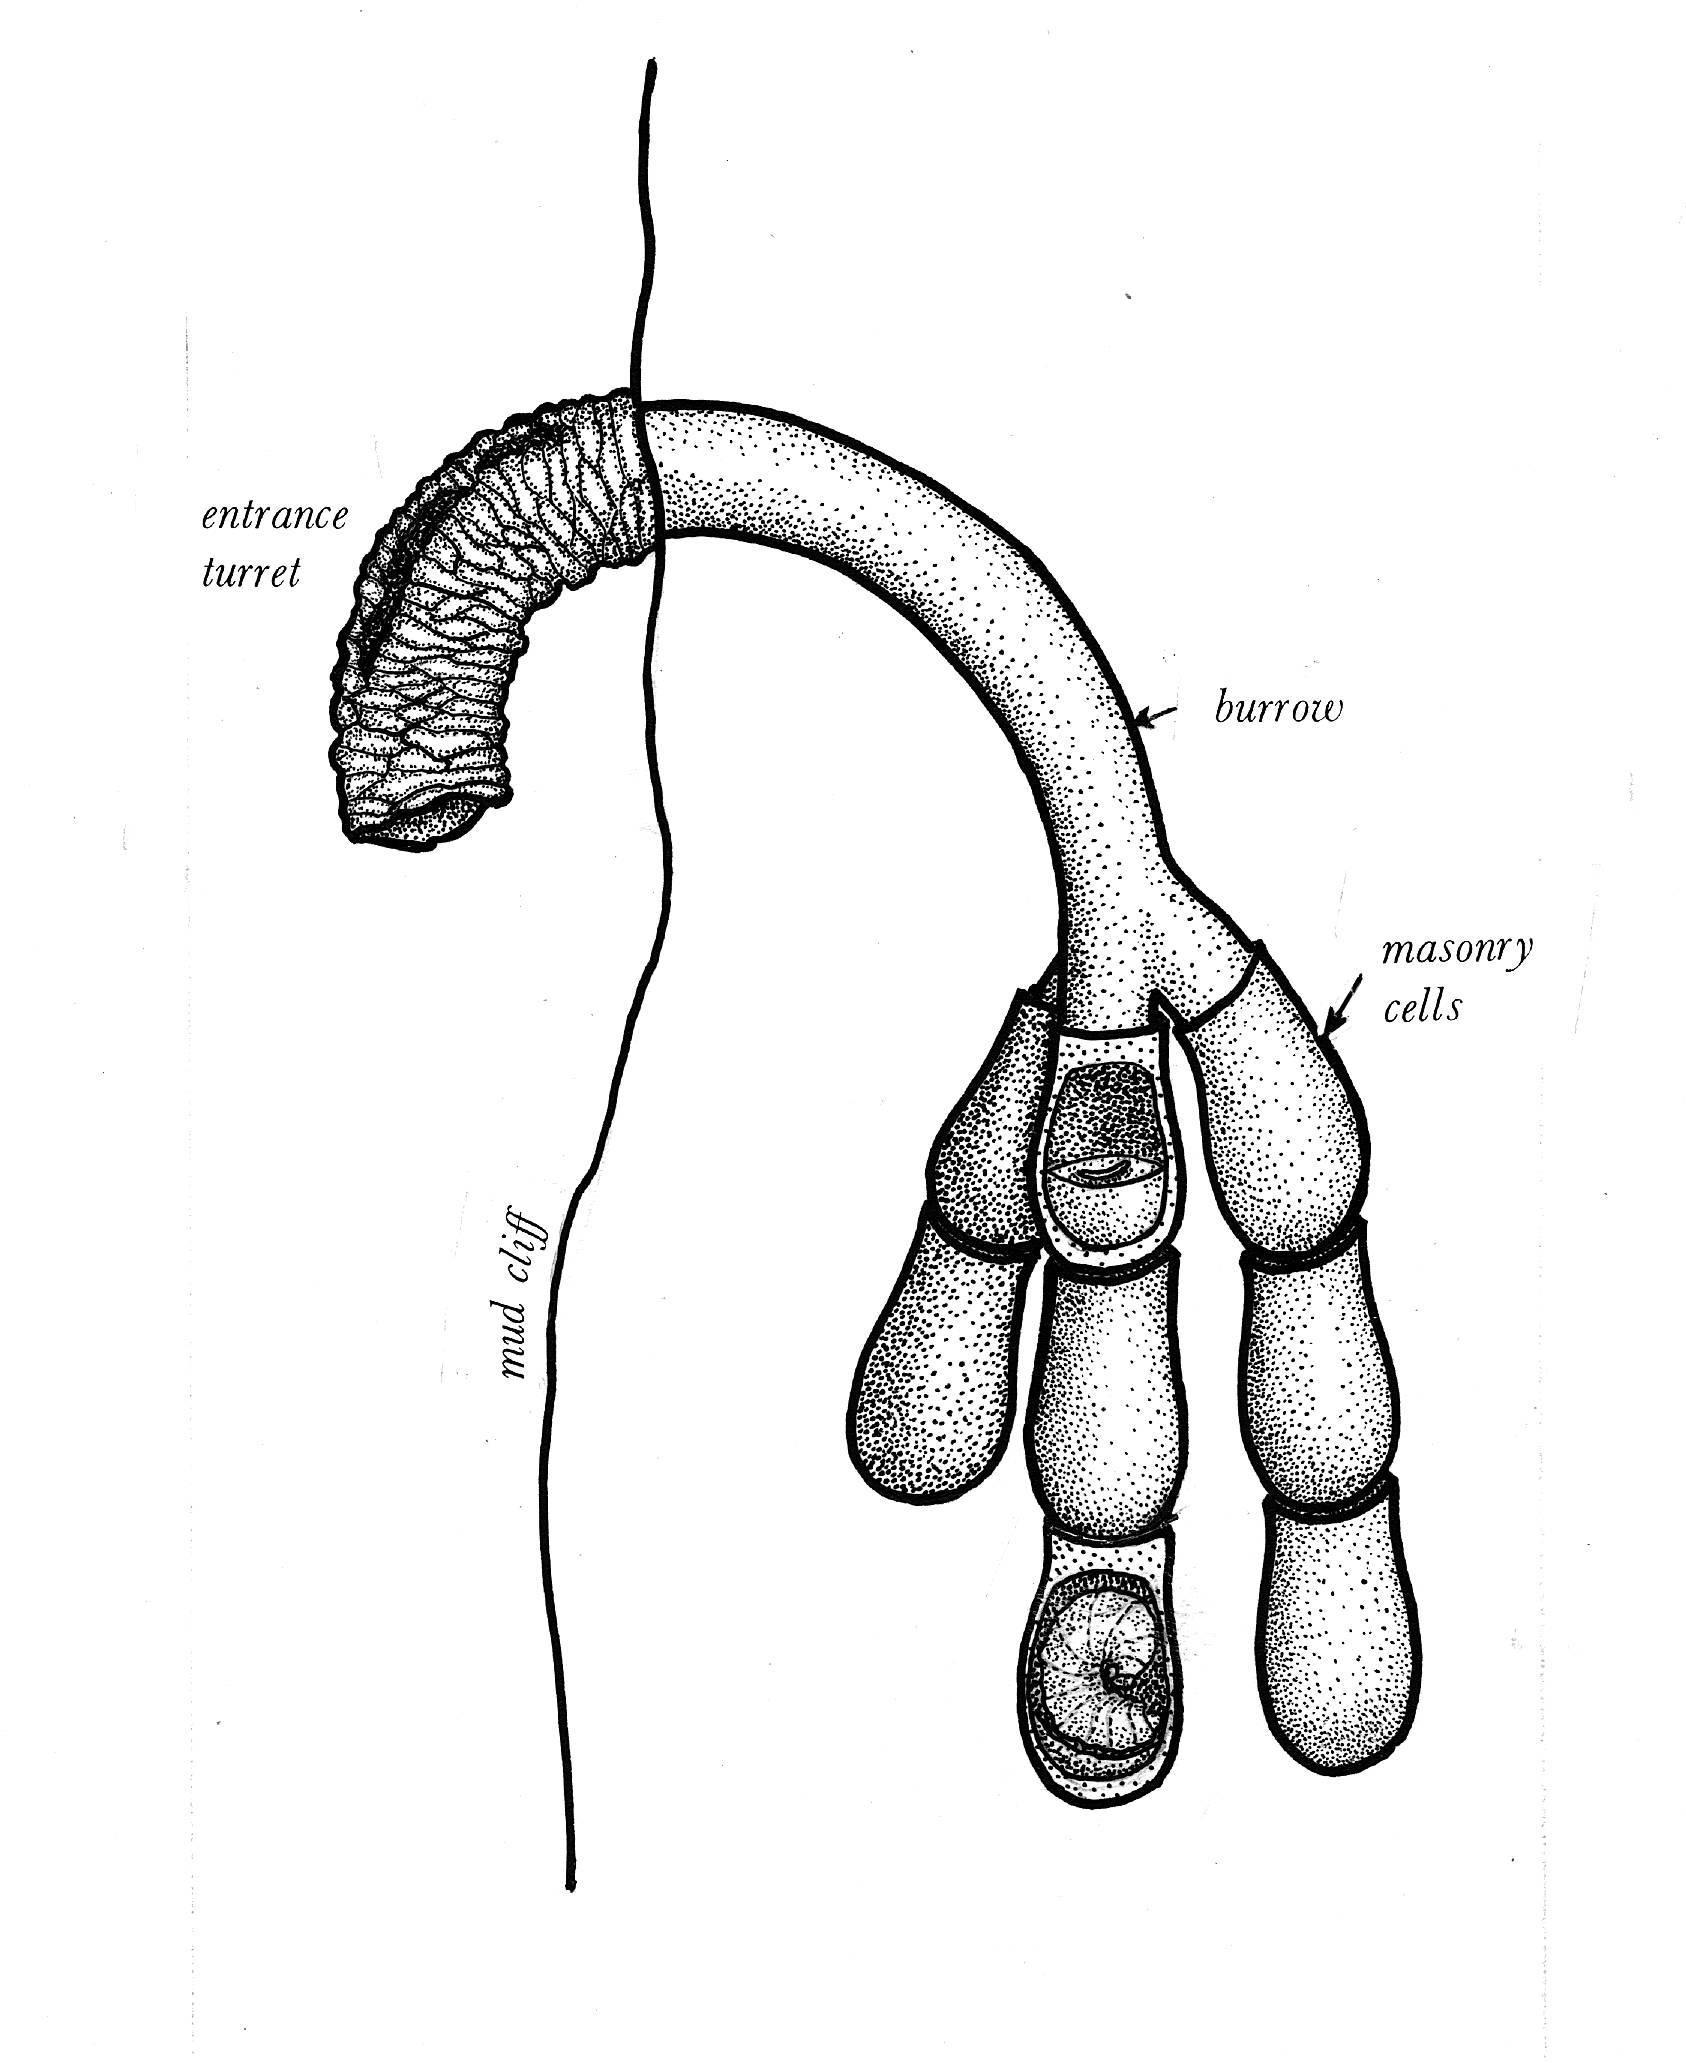 Image of Western Anthophora